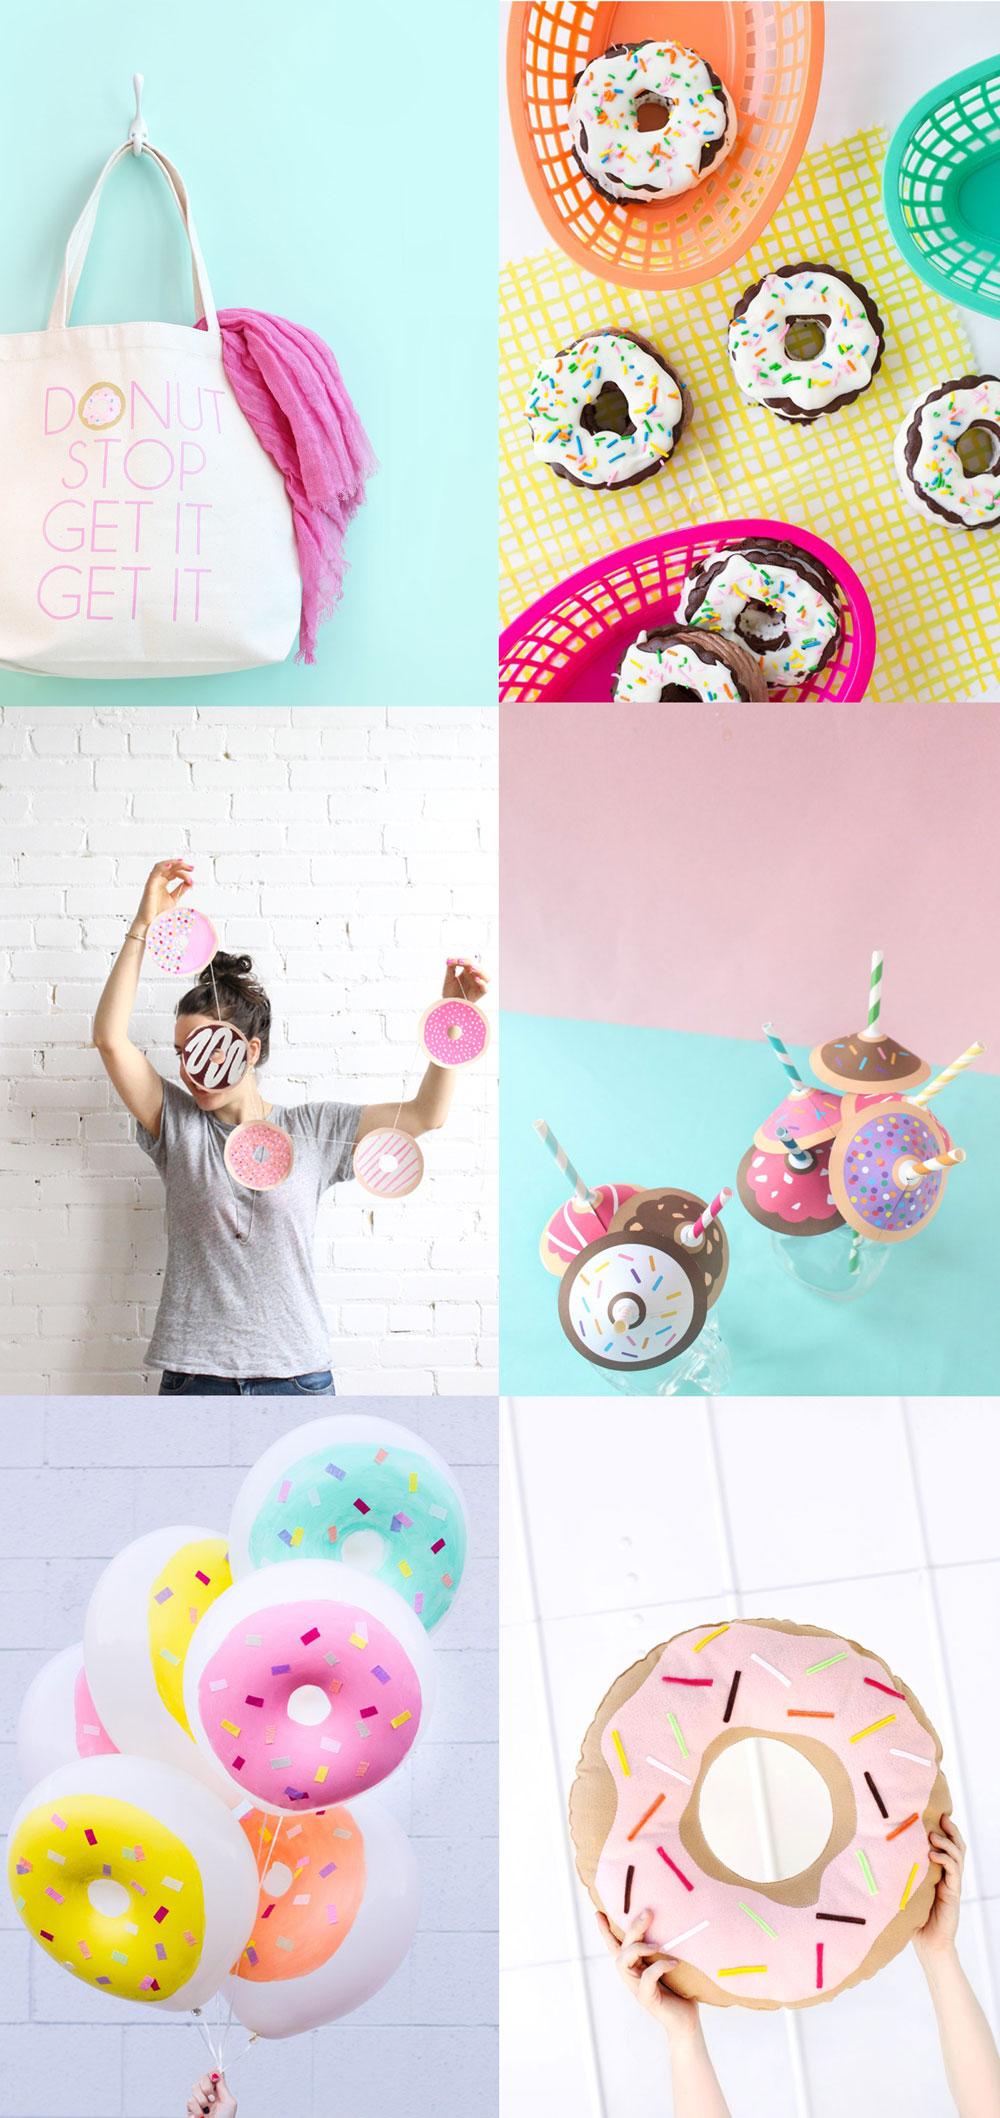 Donut-DIY-ideas